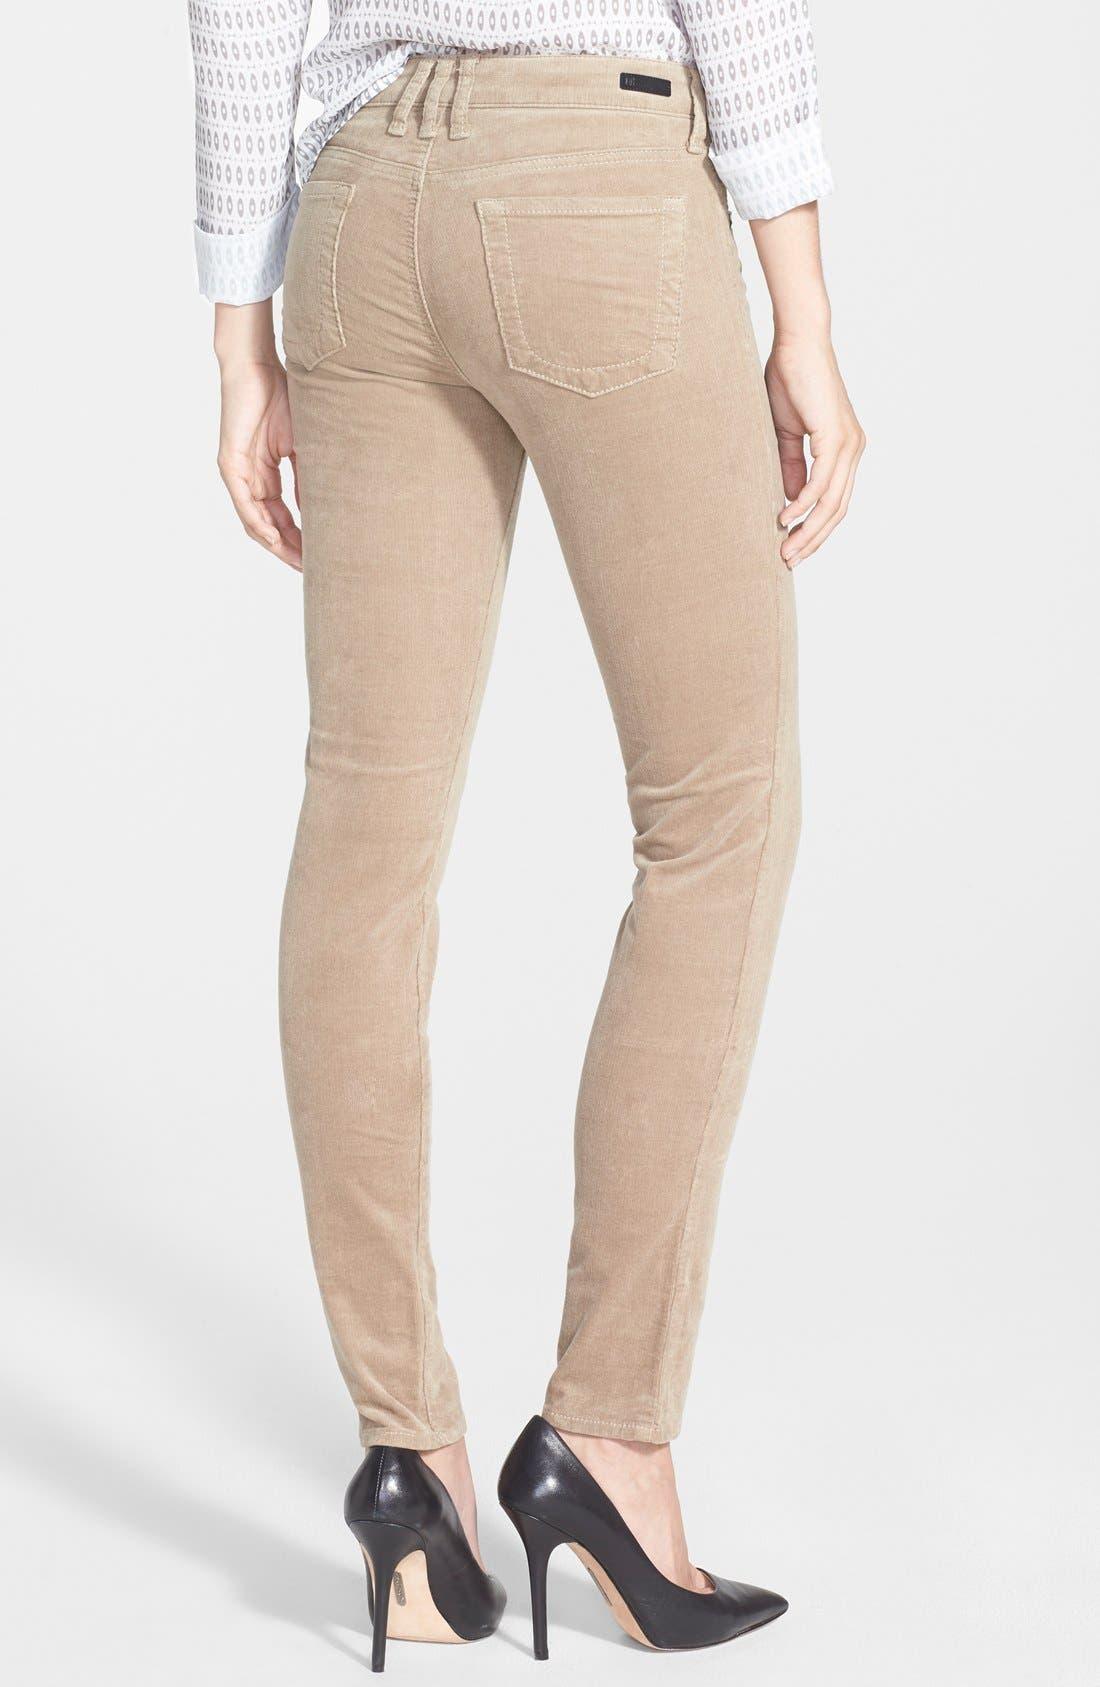 'Diana' Stretch Corduroy Skinny Pants,                             Alternate thumbnail 128, color,